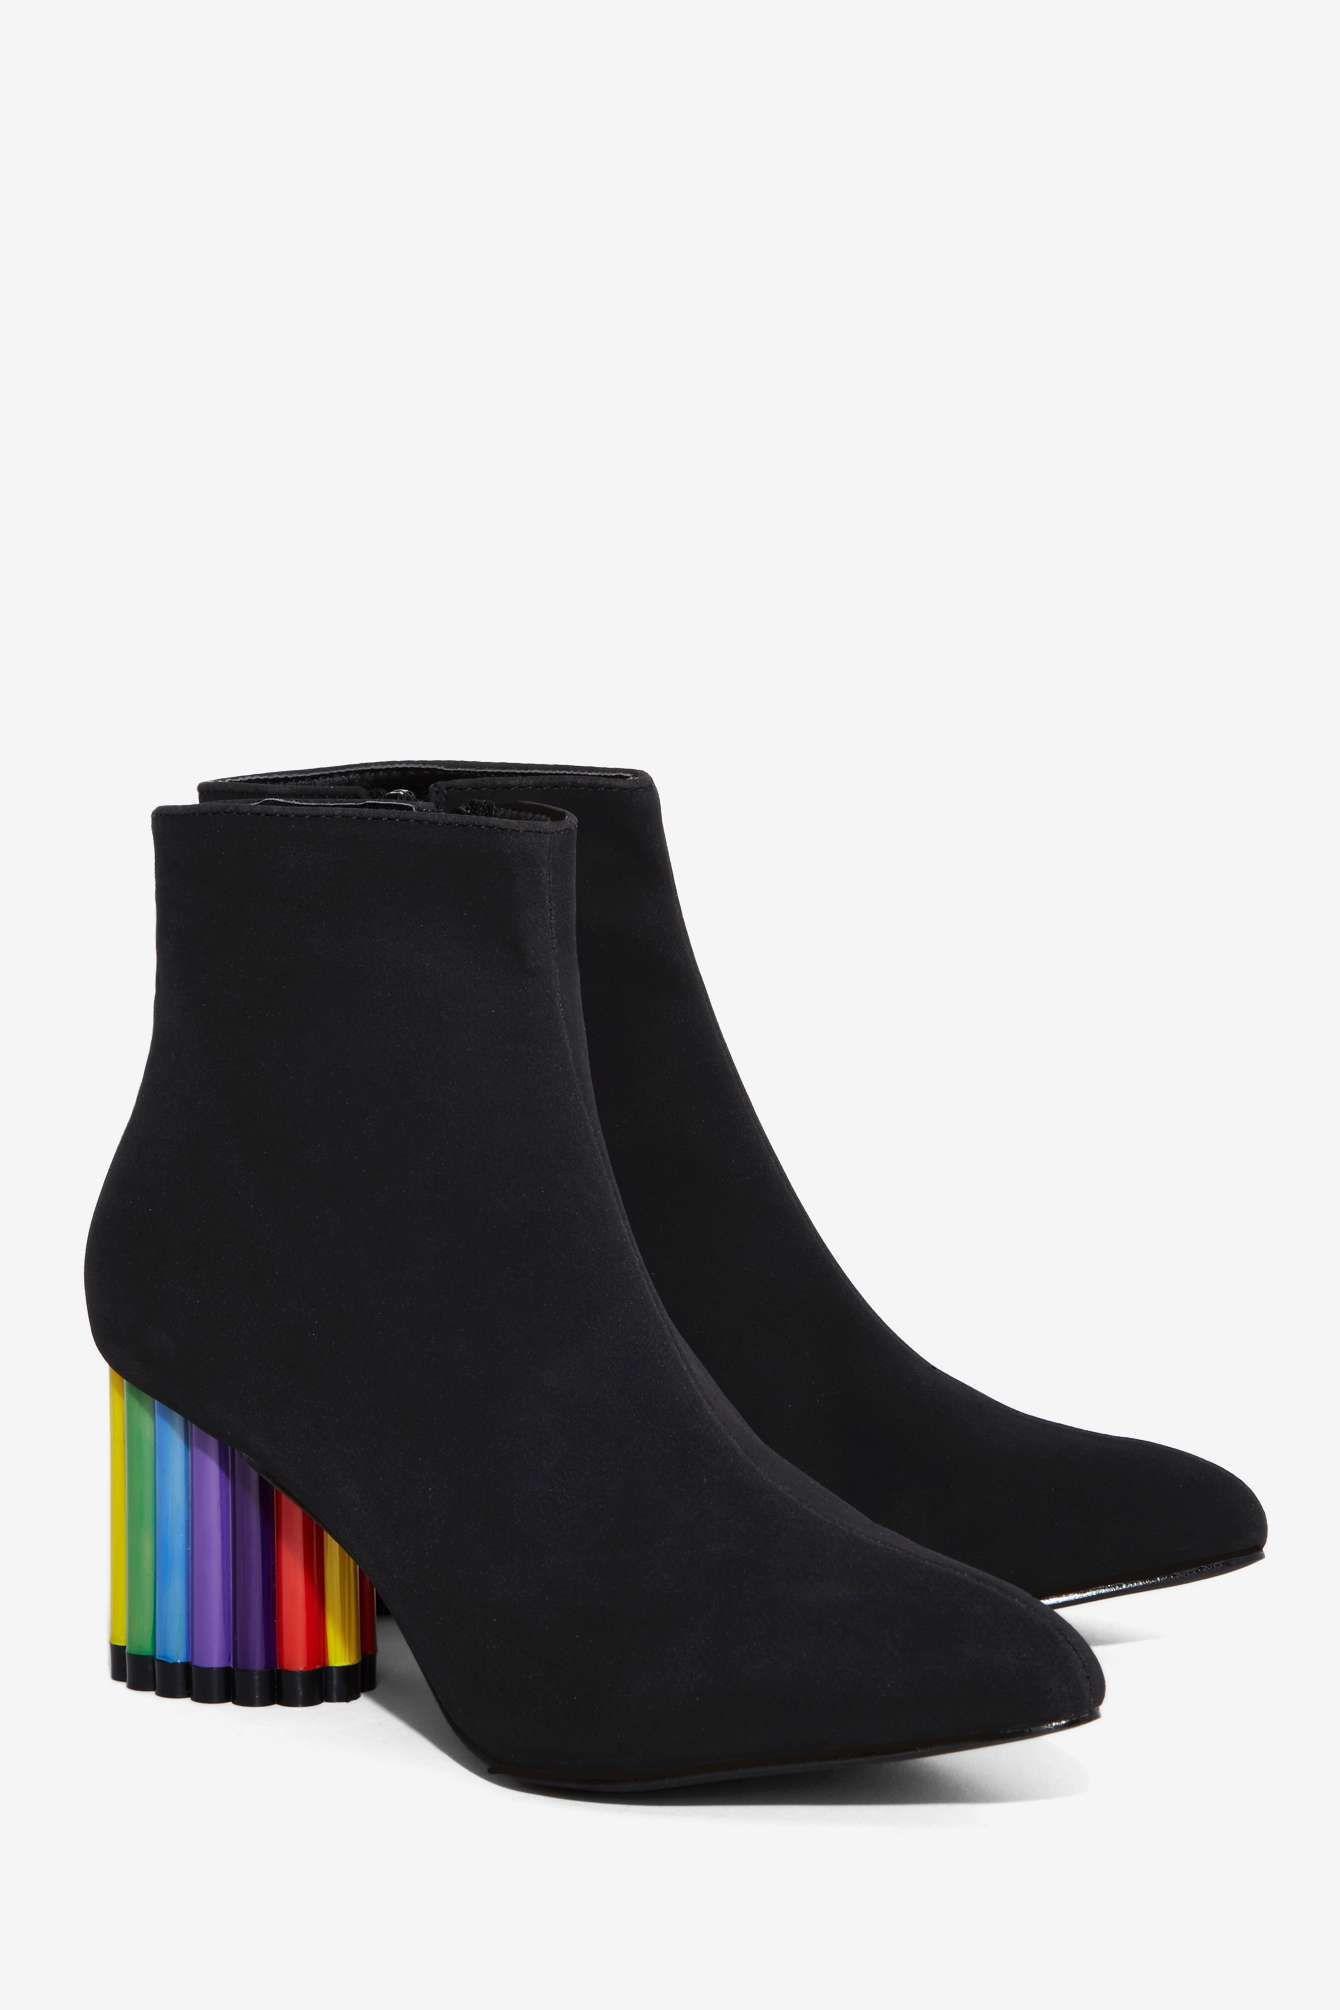 YRU Rainbow Road Vegan Leather Boot | Shop Shoes at Nasty Gal!